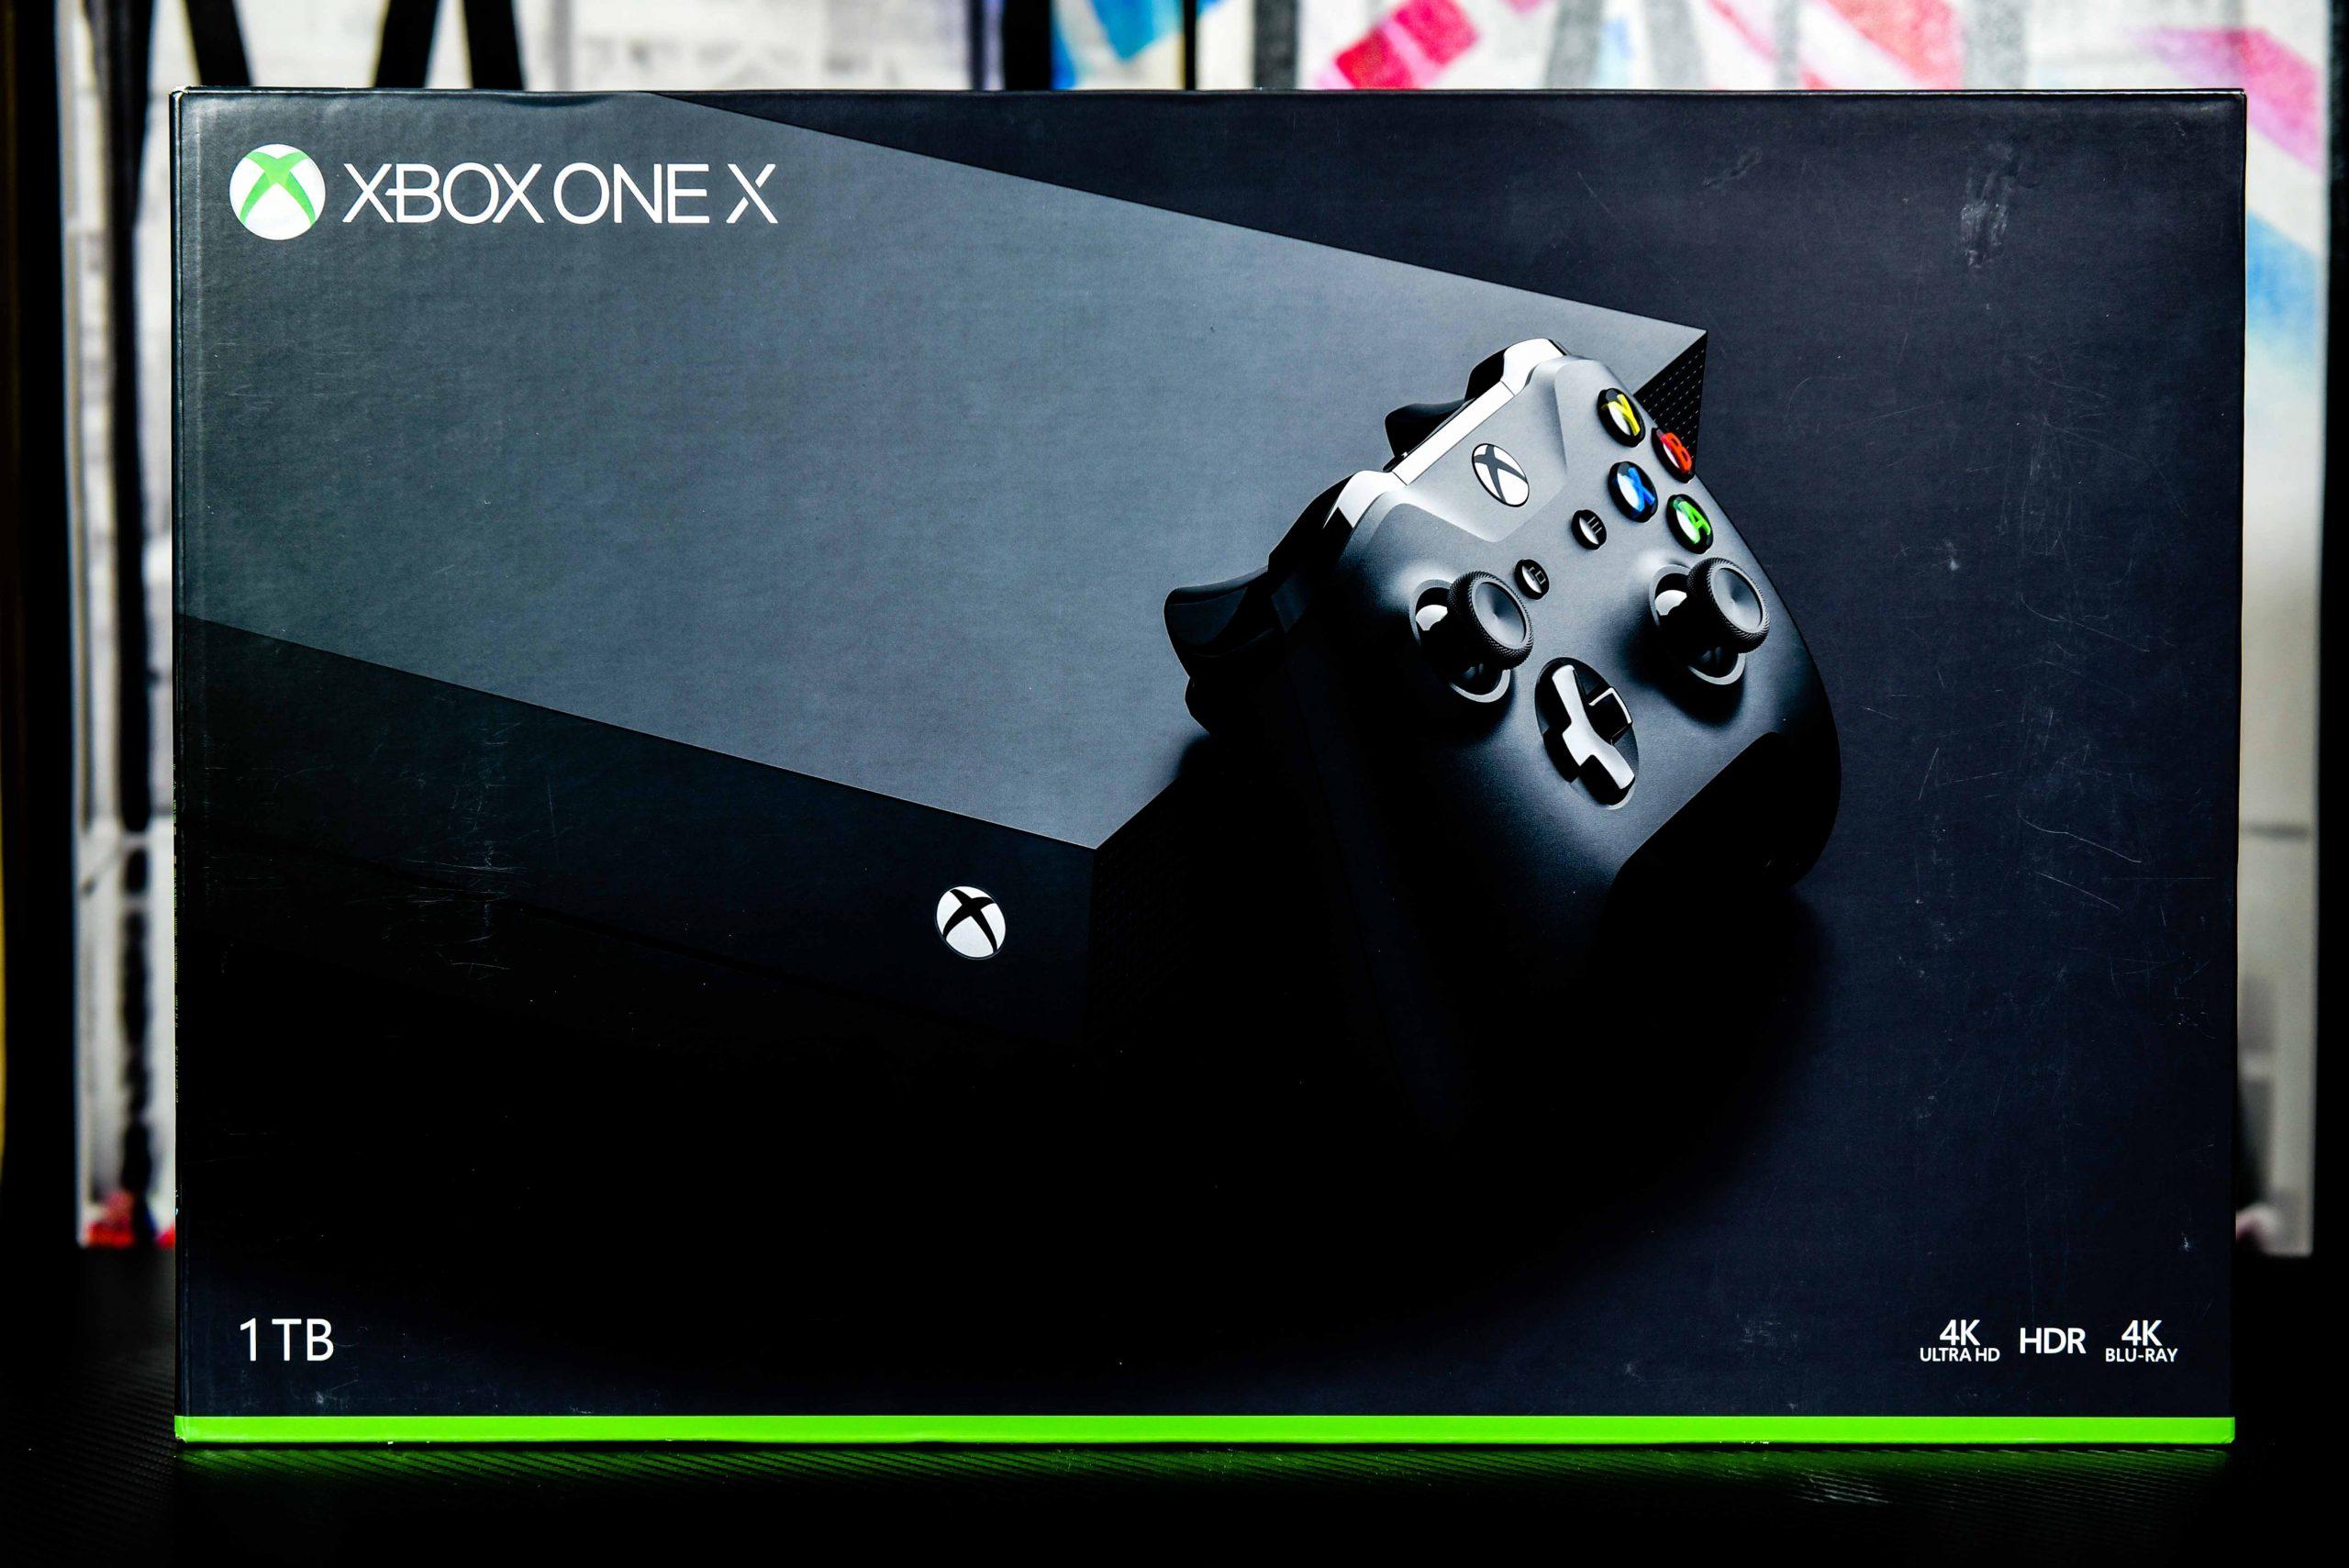 XBOX one X in Qatar